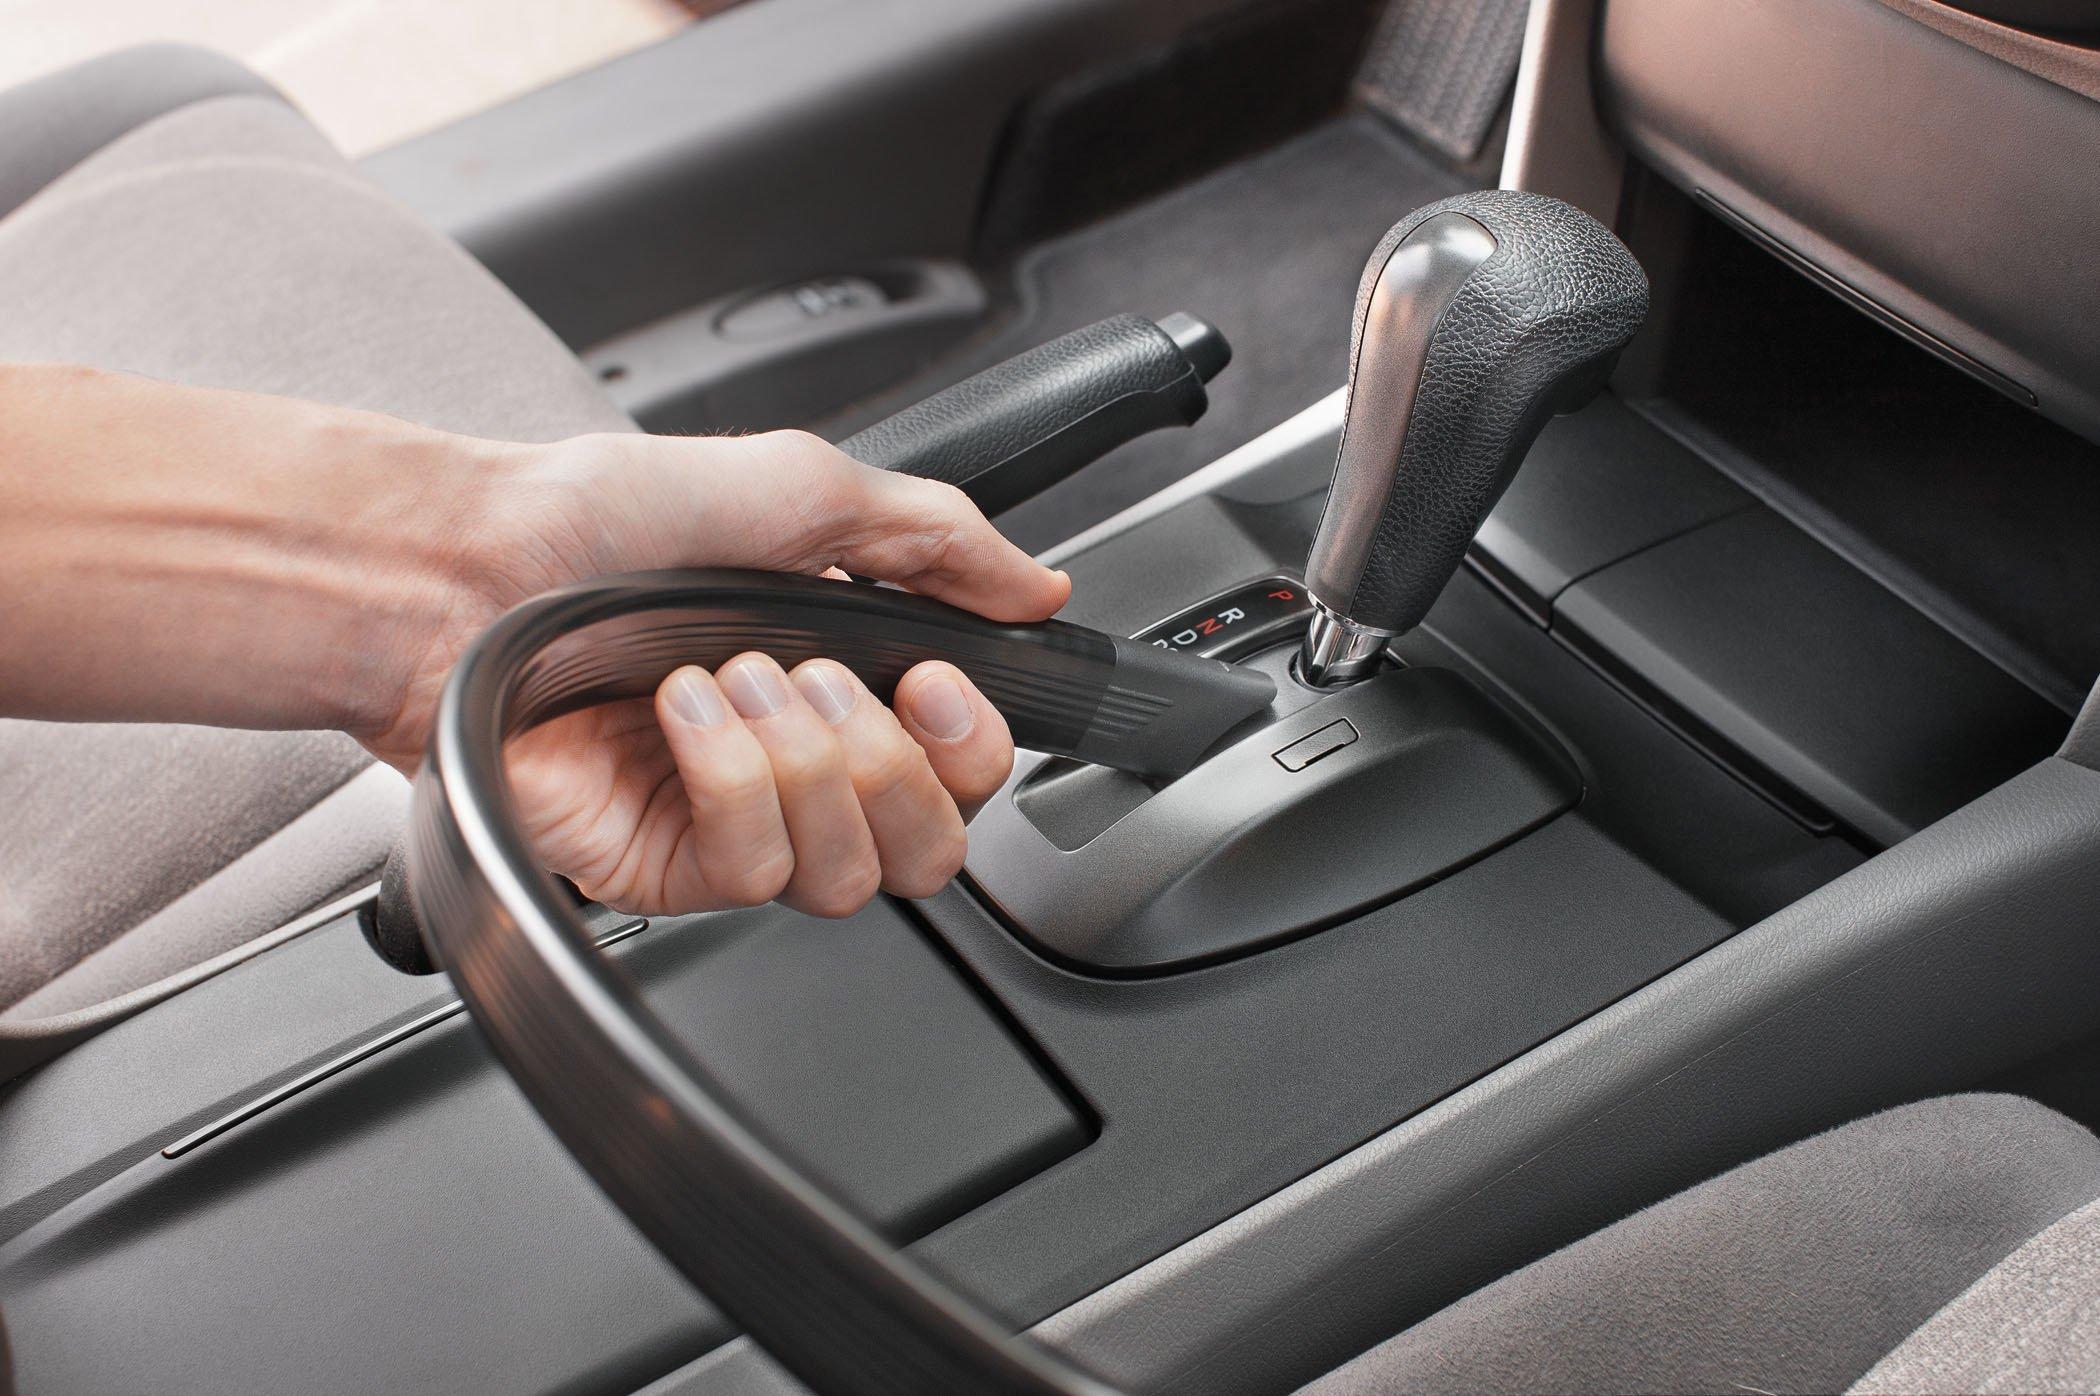 Universal Auto Detailing Kit2